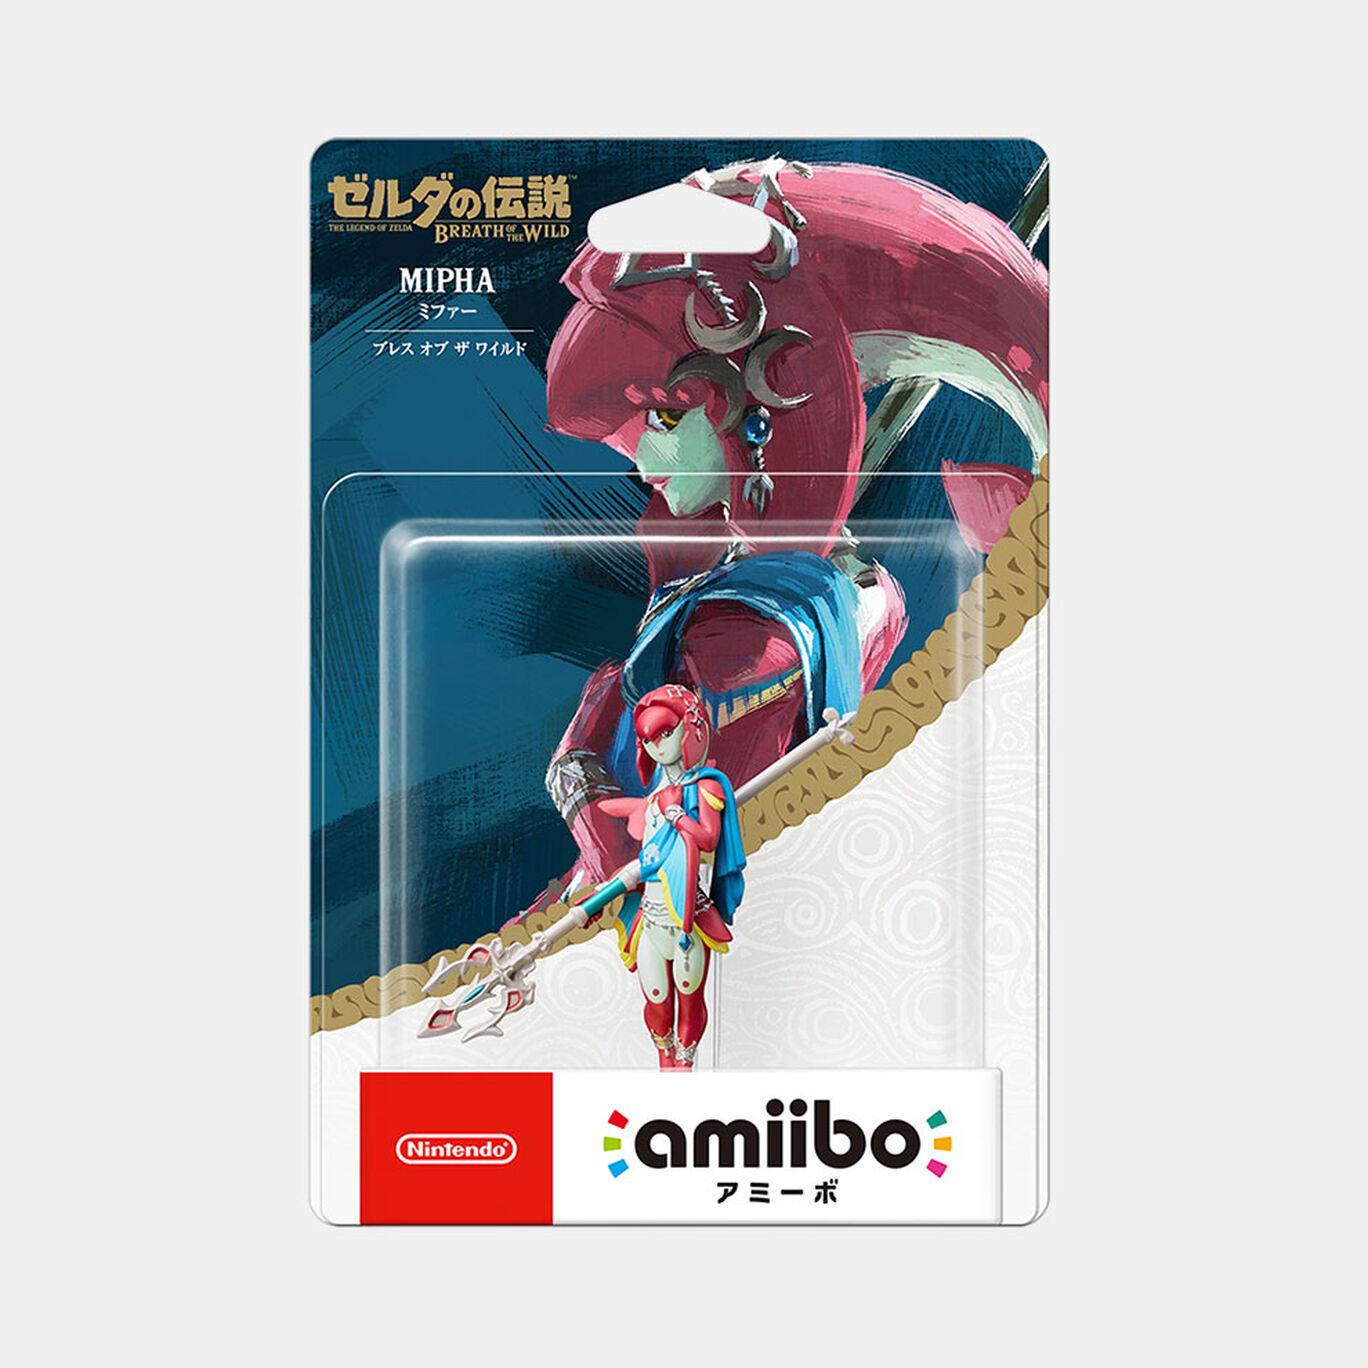 amiibo ミファー【ブレス オブ ザ ワイルド】(ゼルダの伝説シリーズ)